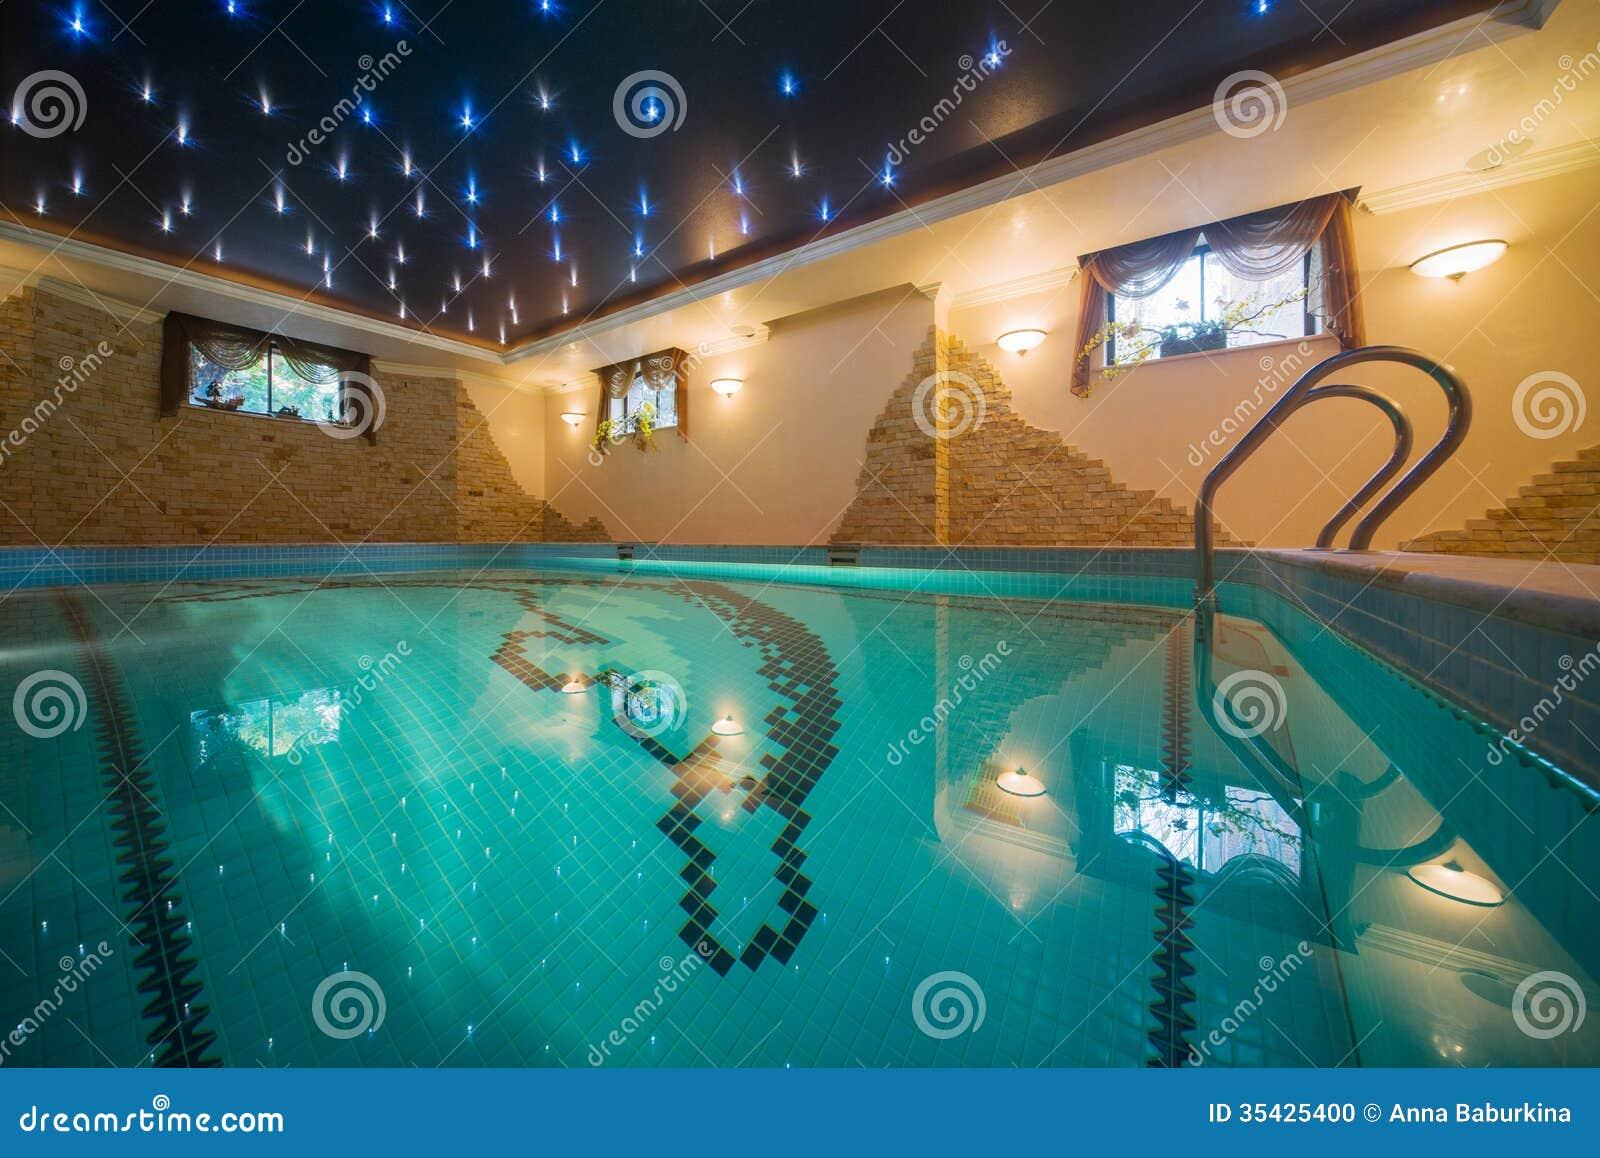 Luxury Swimming Pool Stock Photo Image 35425400